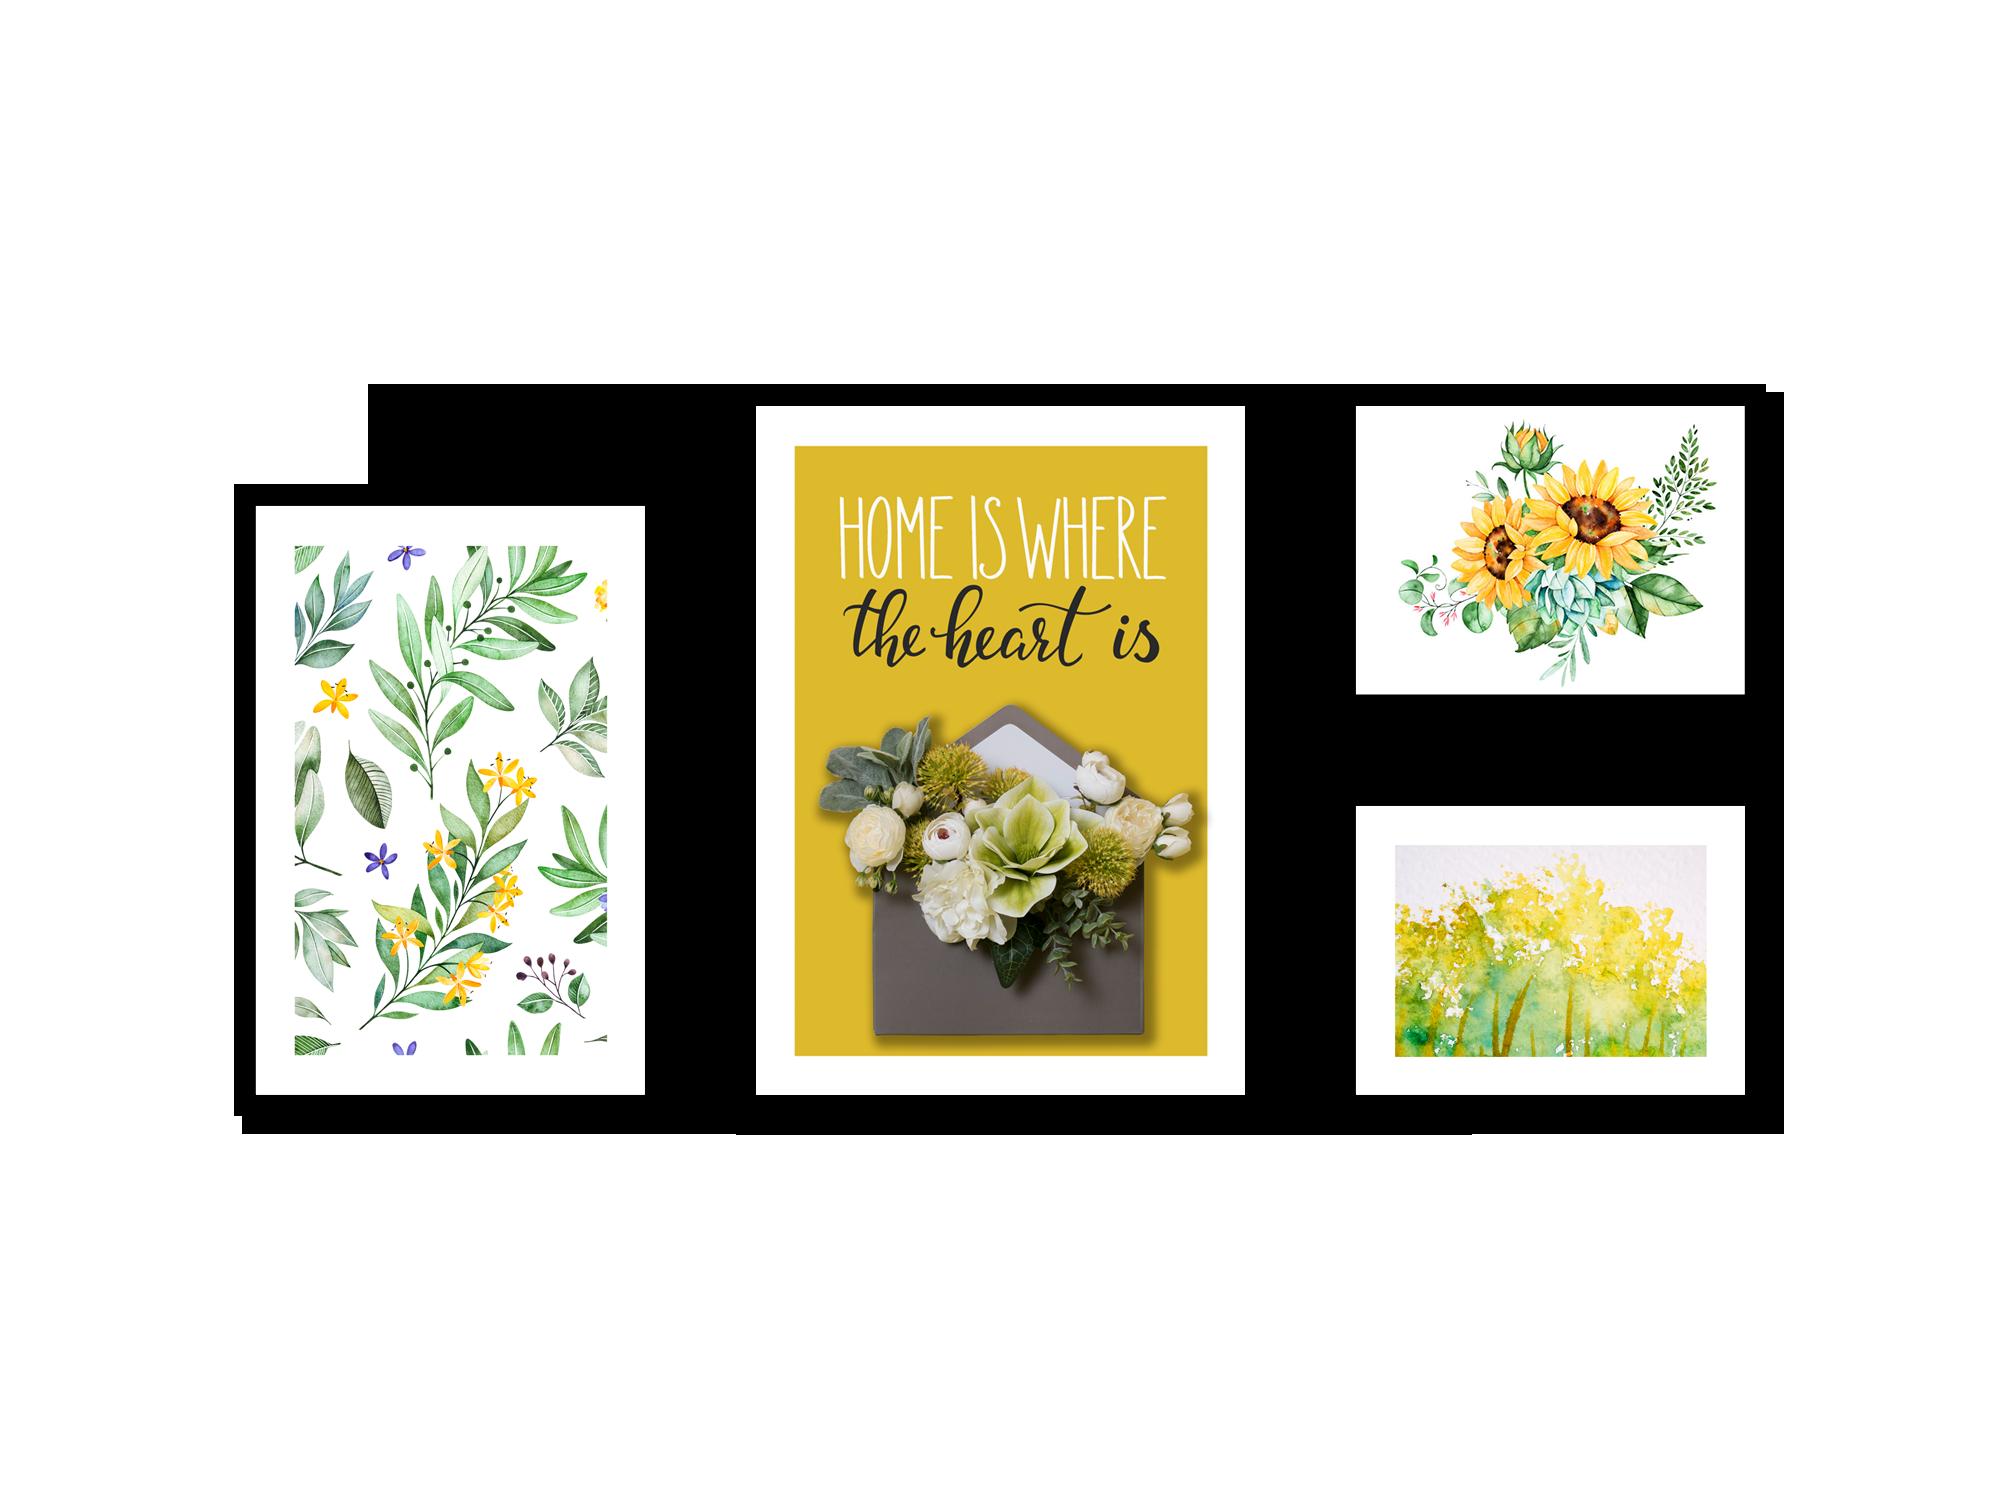 Tranh gắn hoa lụa Yellow messenger